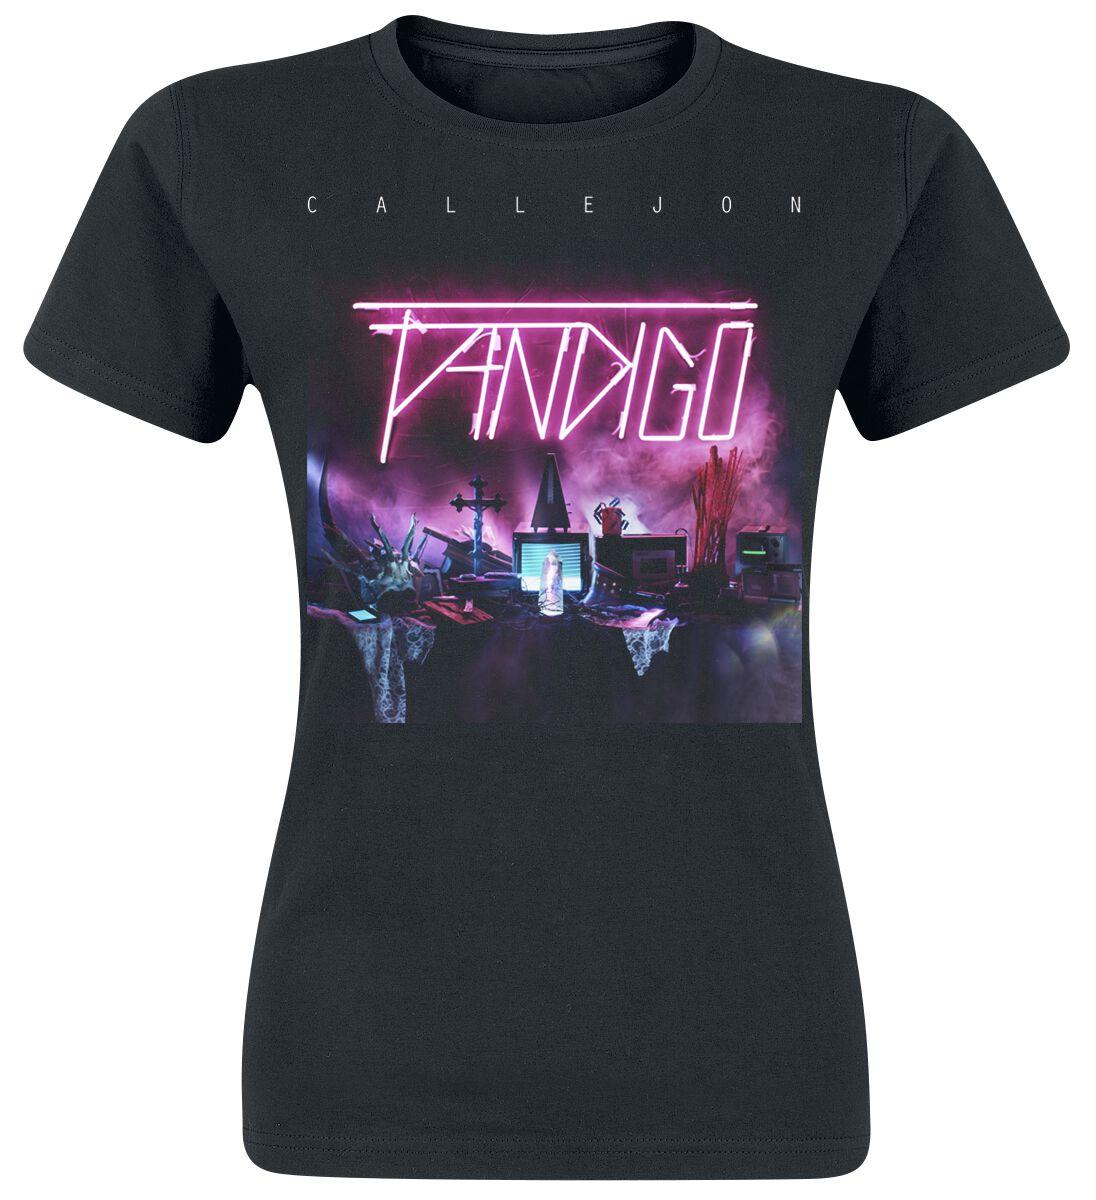 Zespoły - Koszulki - Koszulka damska Callejon Fandigo Artwork Koszulka damska czarny - 364450